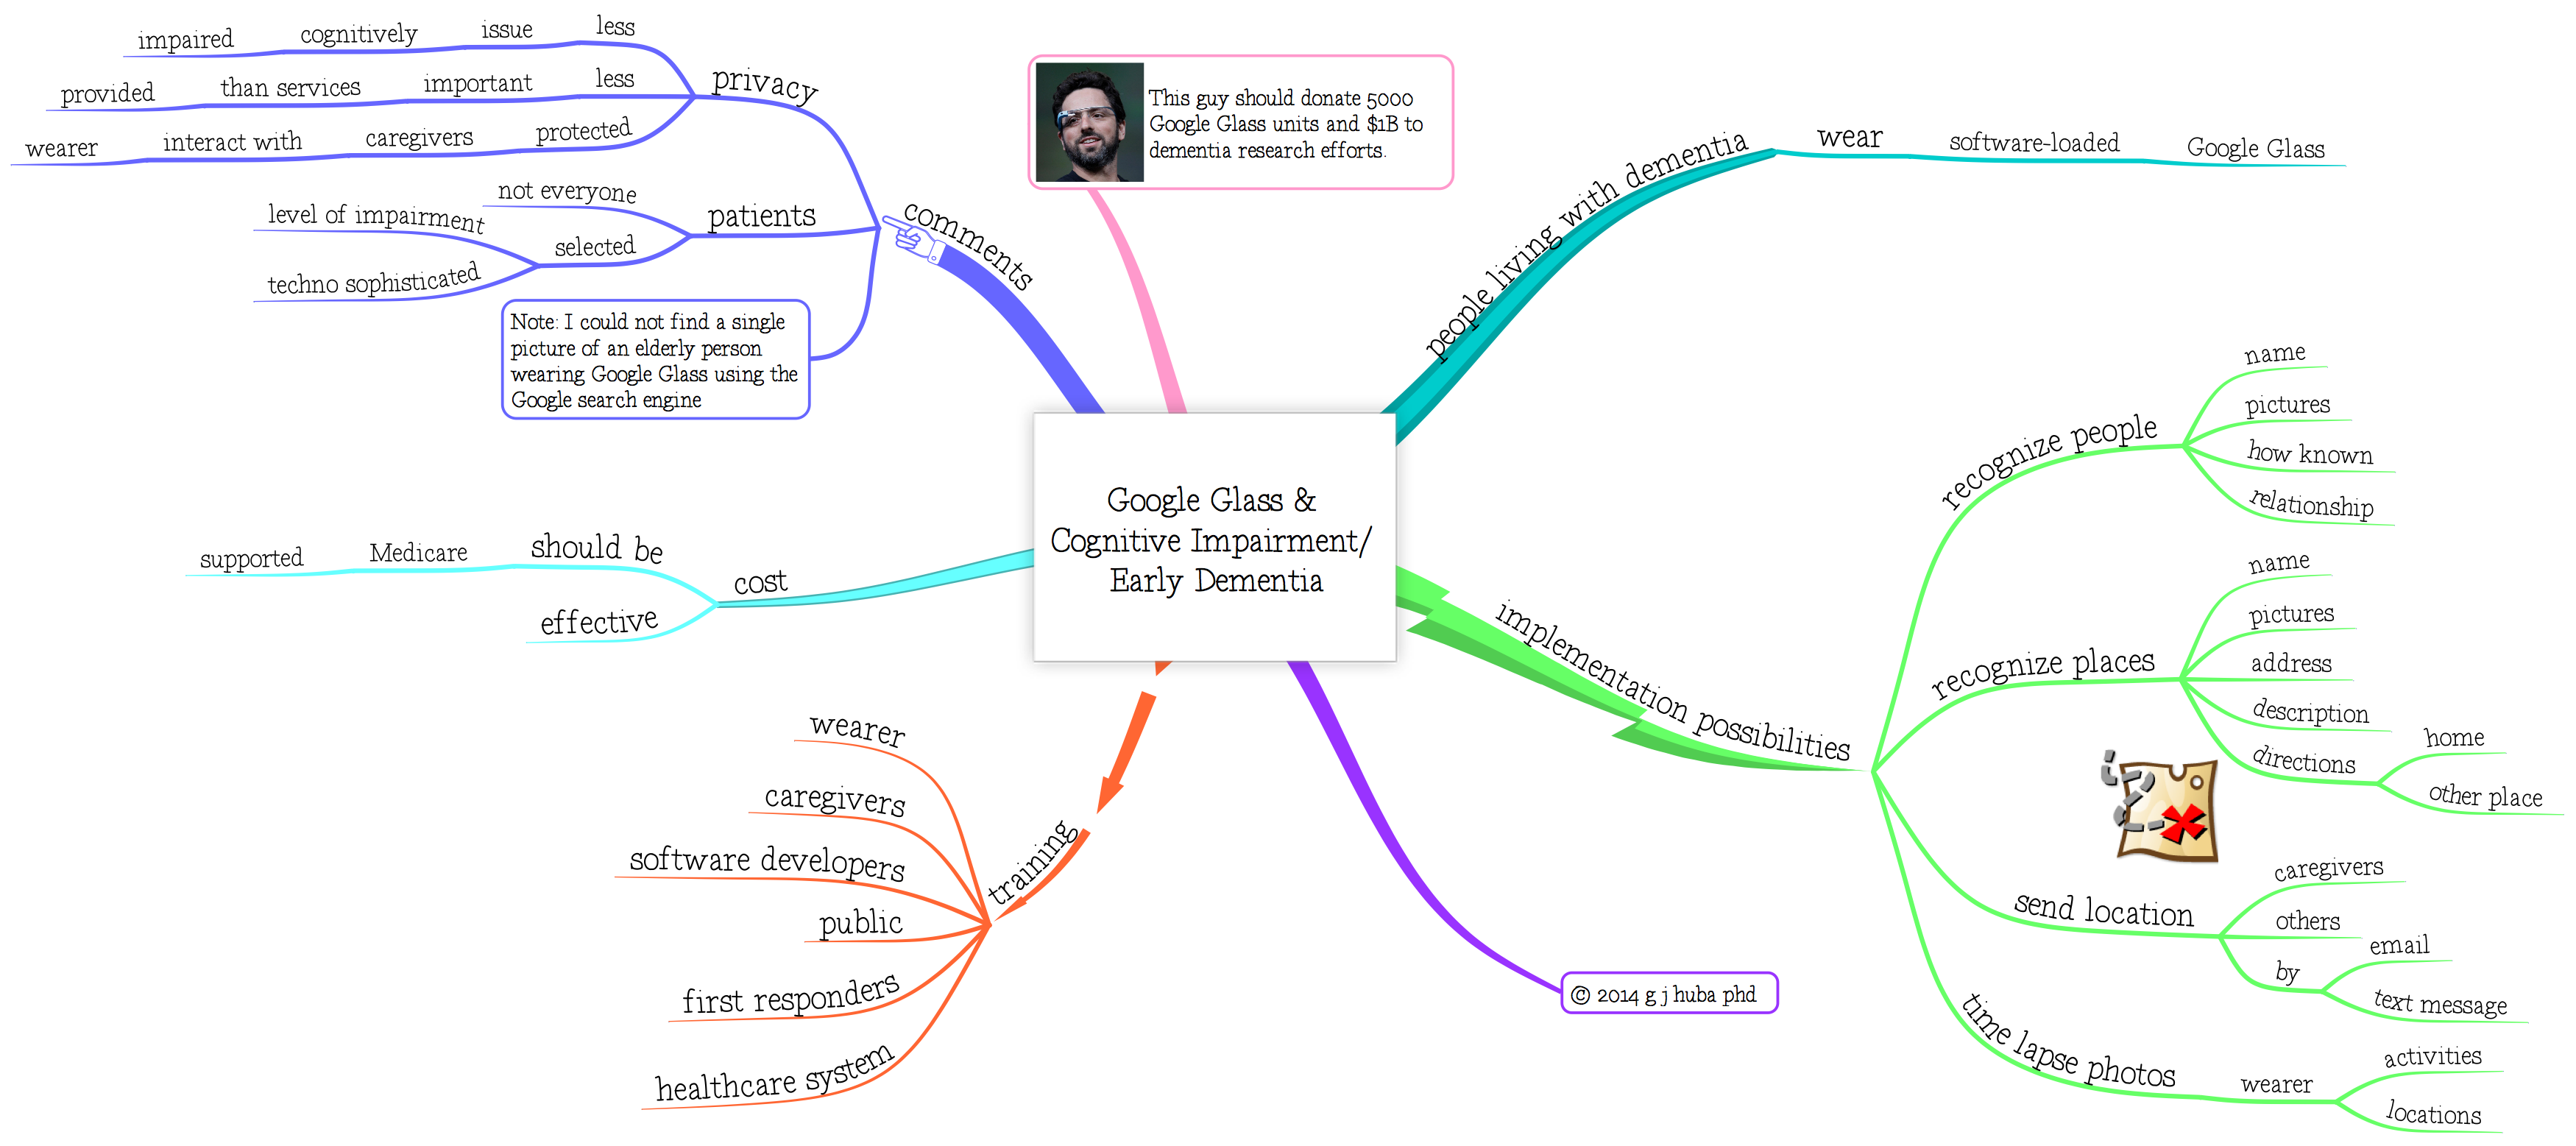 Google Glass &  Cognitive Impairment  Early Dementia